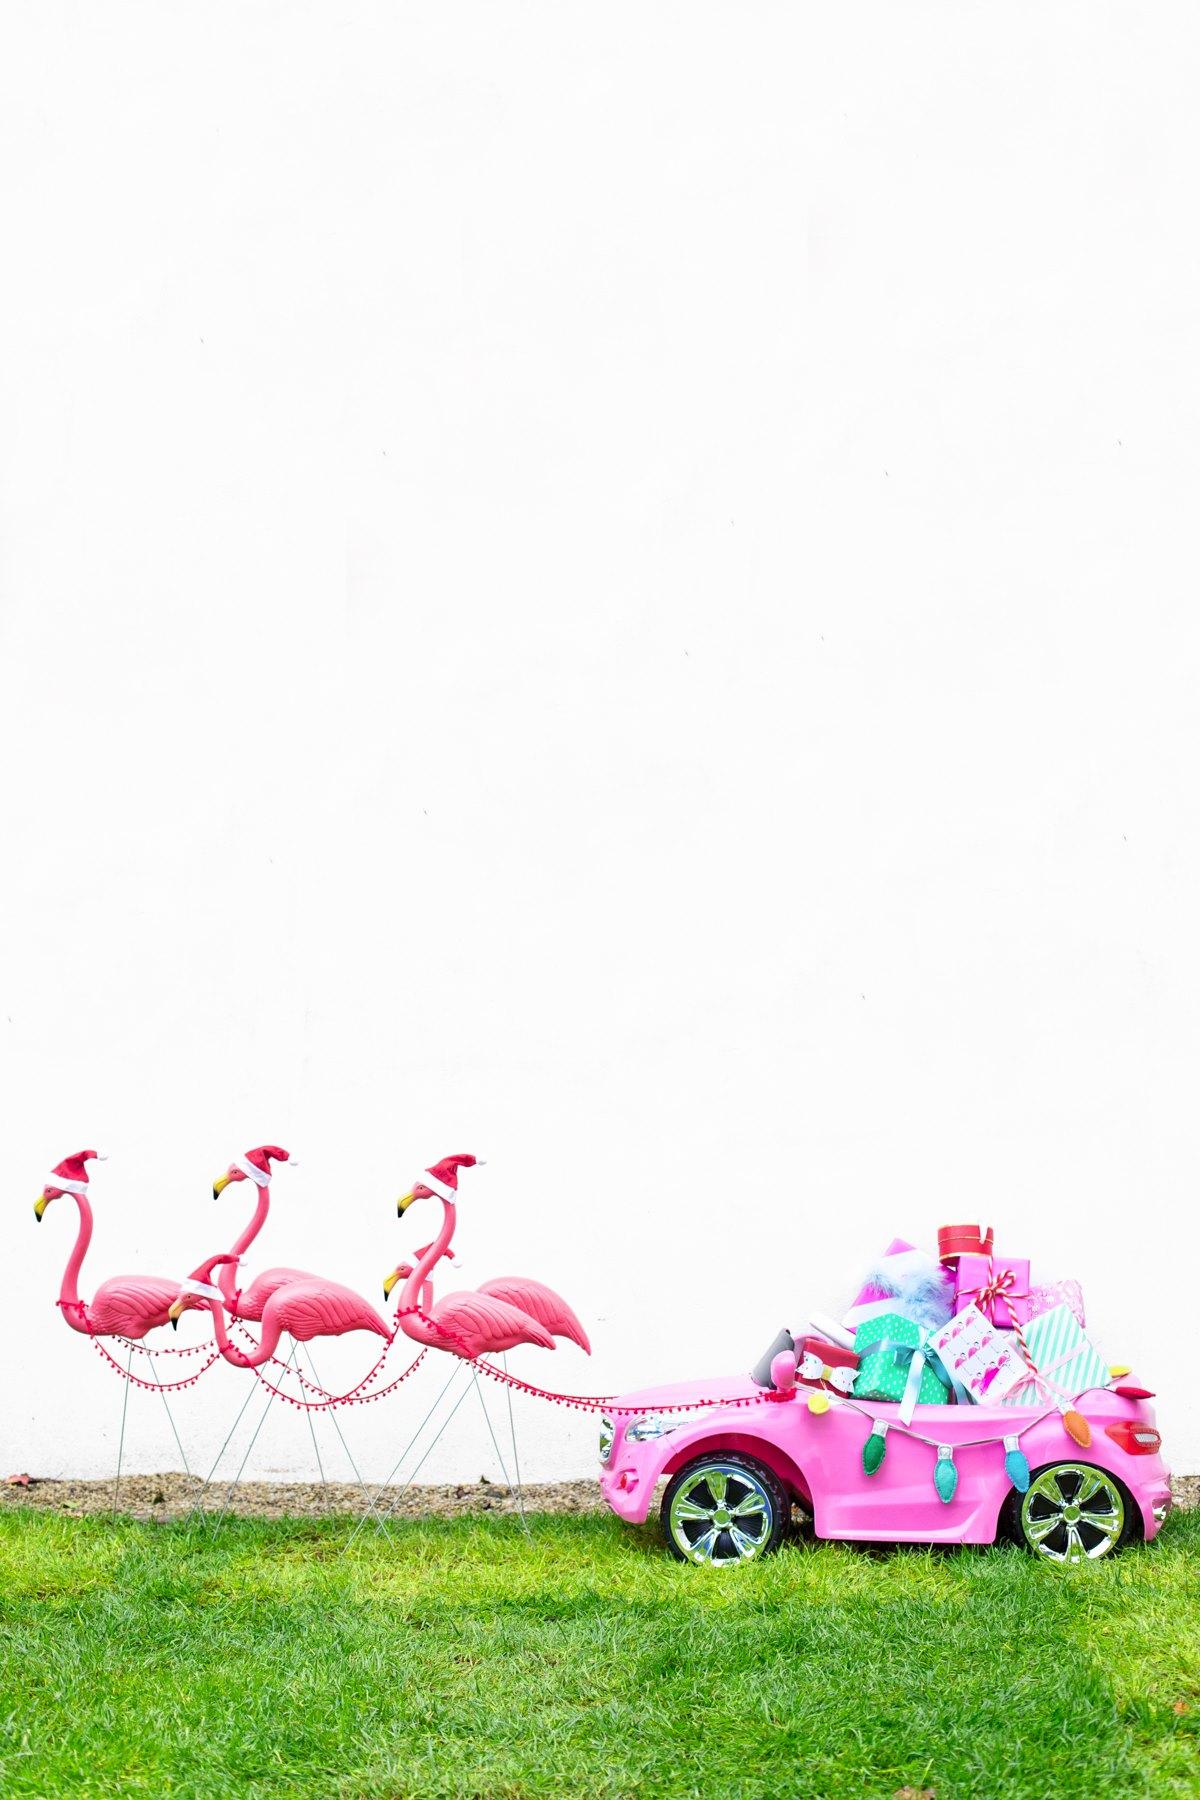 Flamingo sleigh from Studio DIY